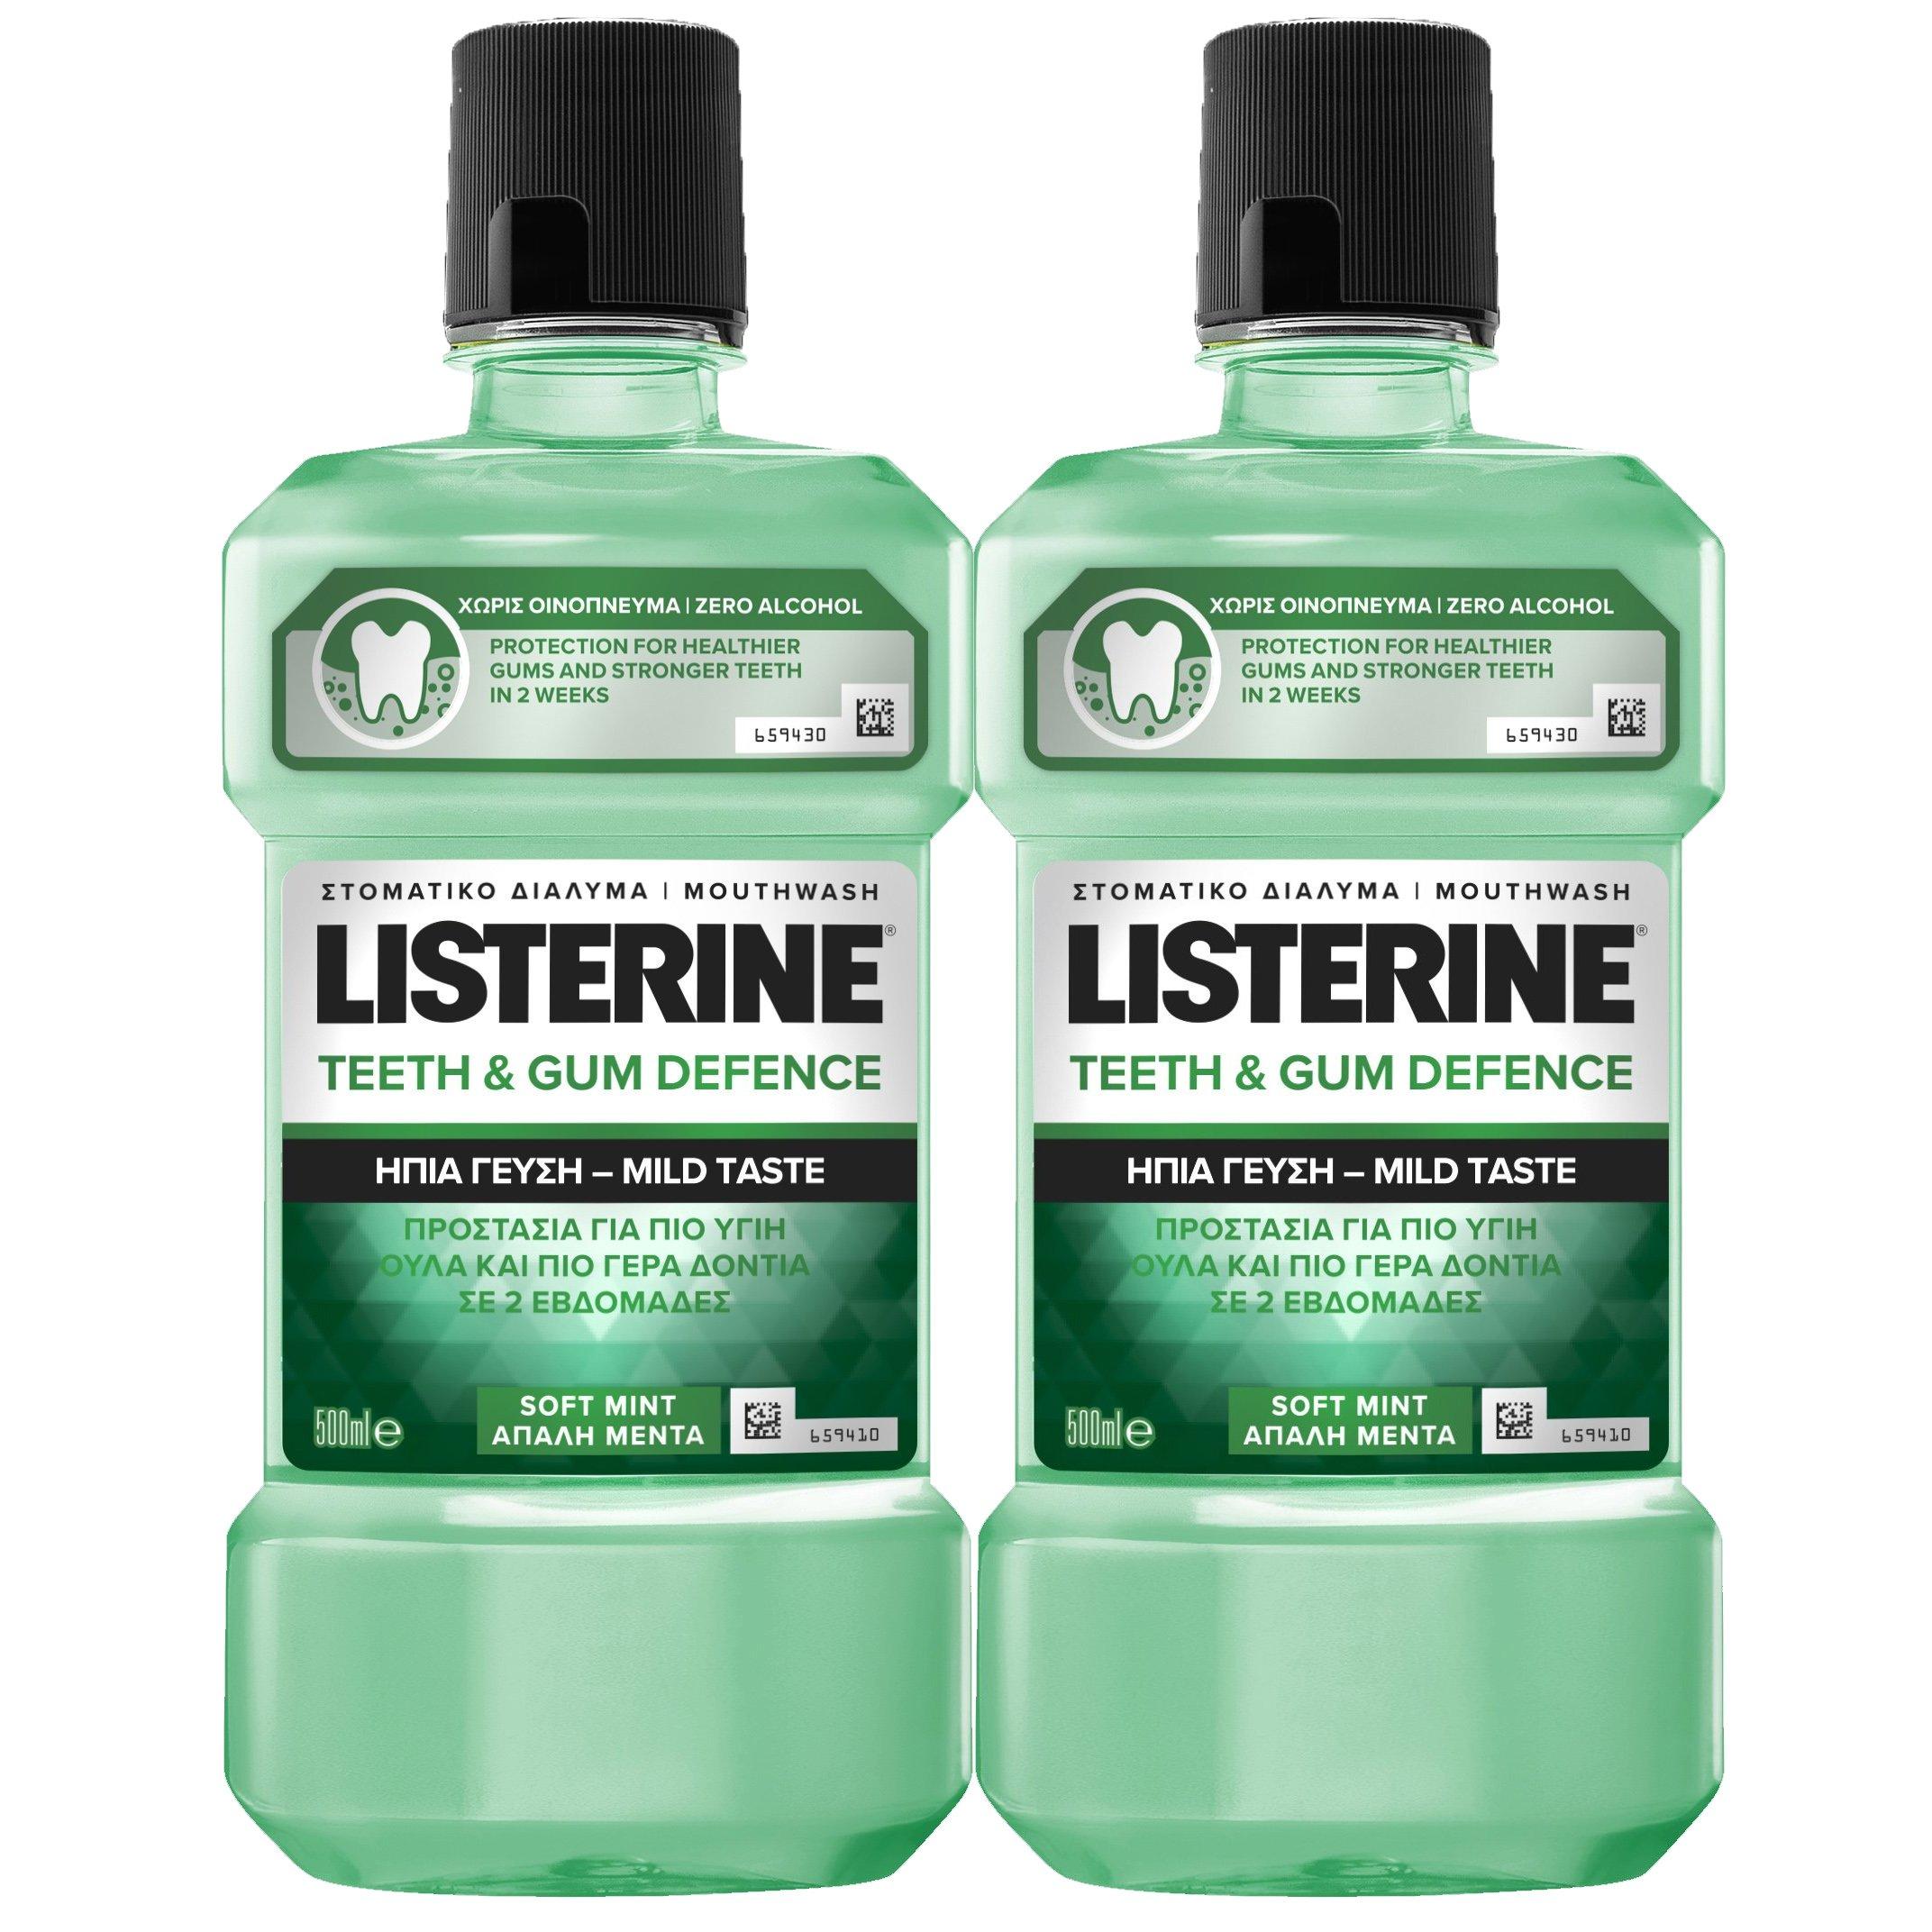 Listerine Πακέτο Προσφοράς Teeth & Gum Defence Στοματικό Διάλυμα Ενδυναμώνει τα Δόντια & Προστατεύει τα Ούλα 2x500ml